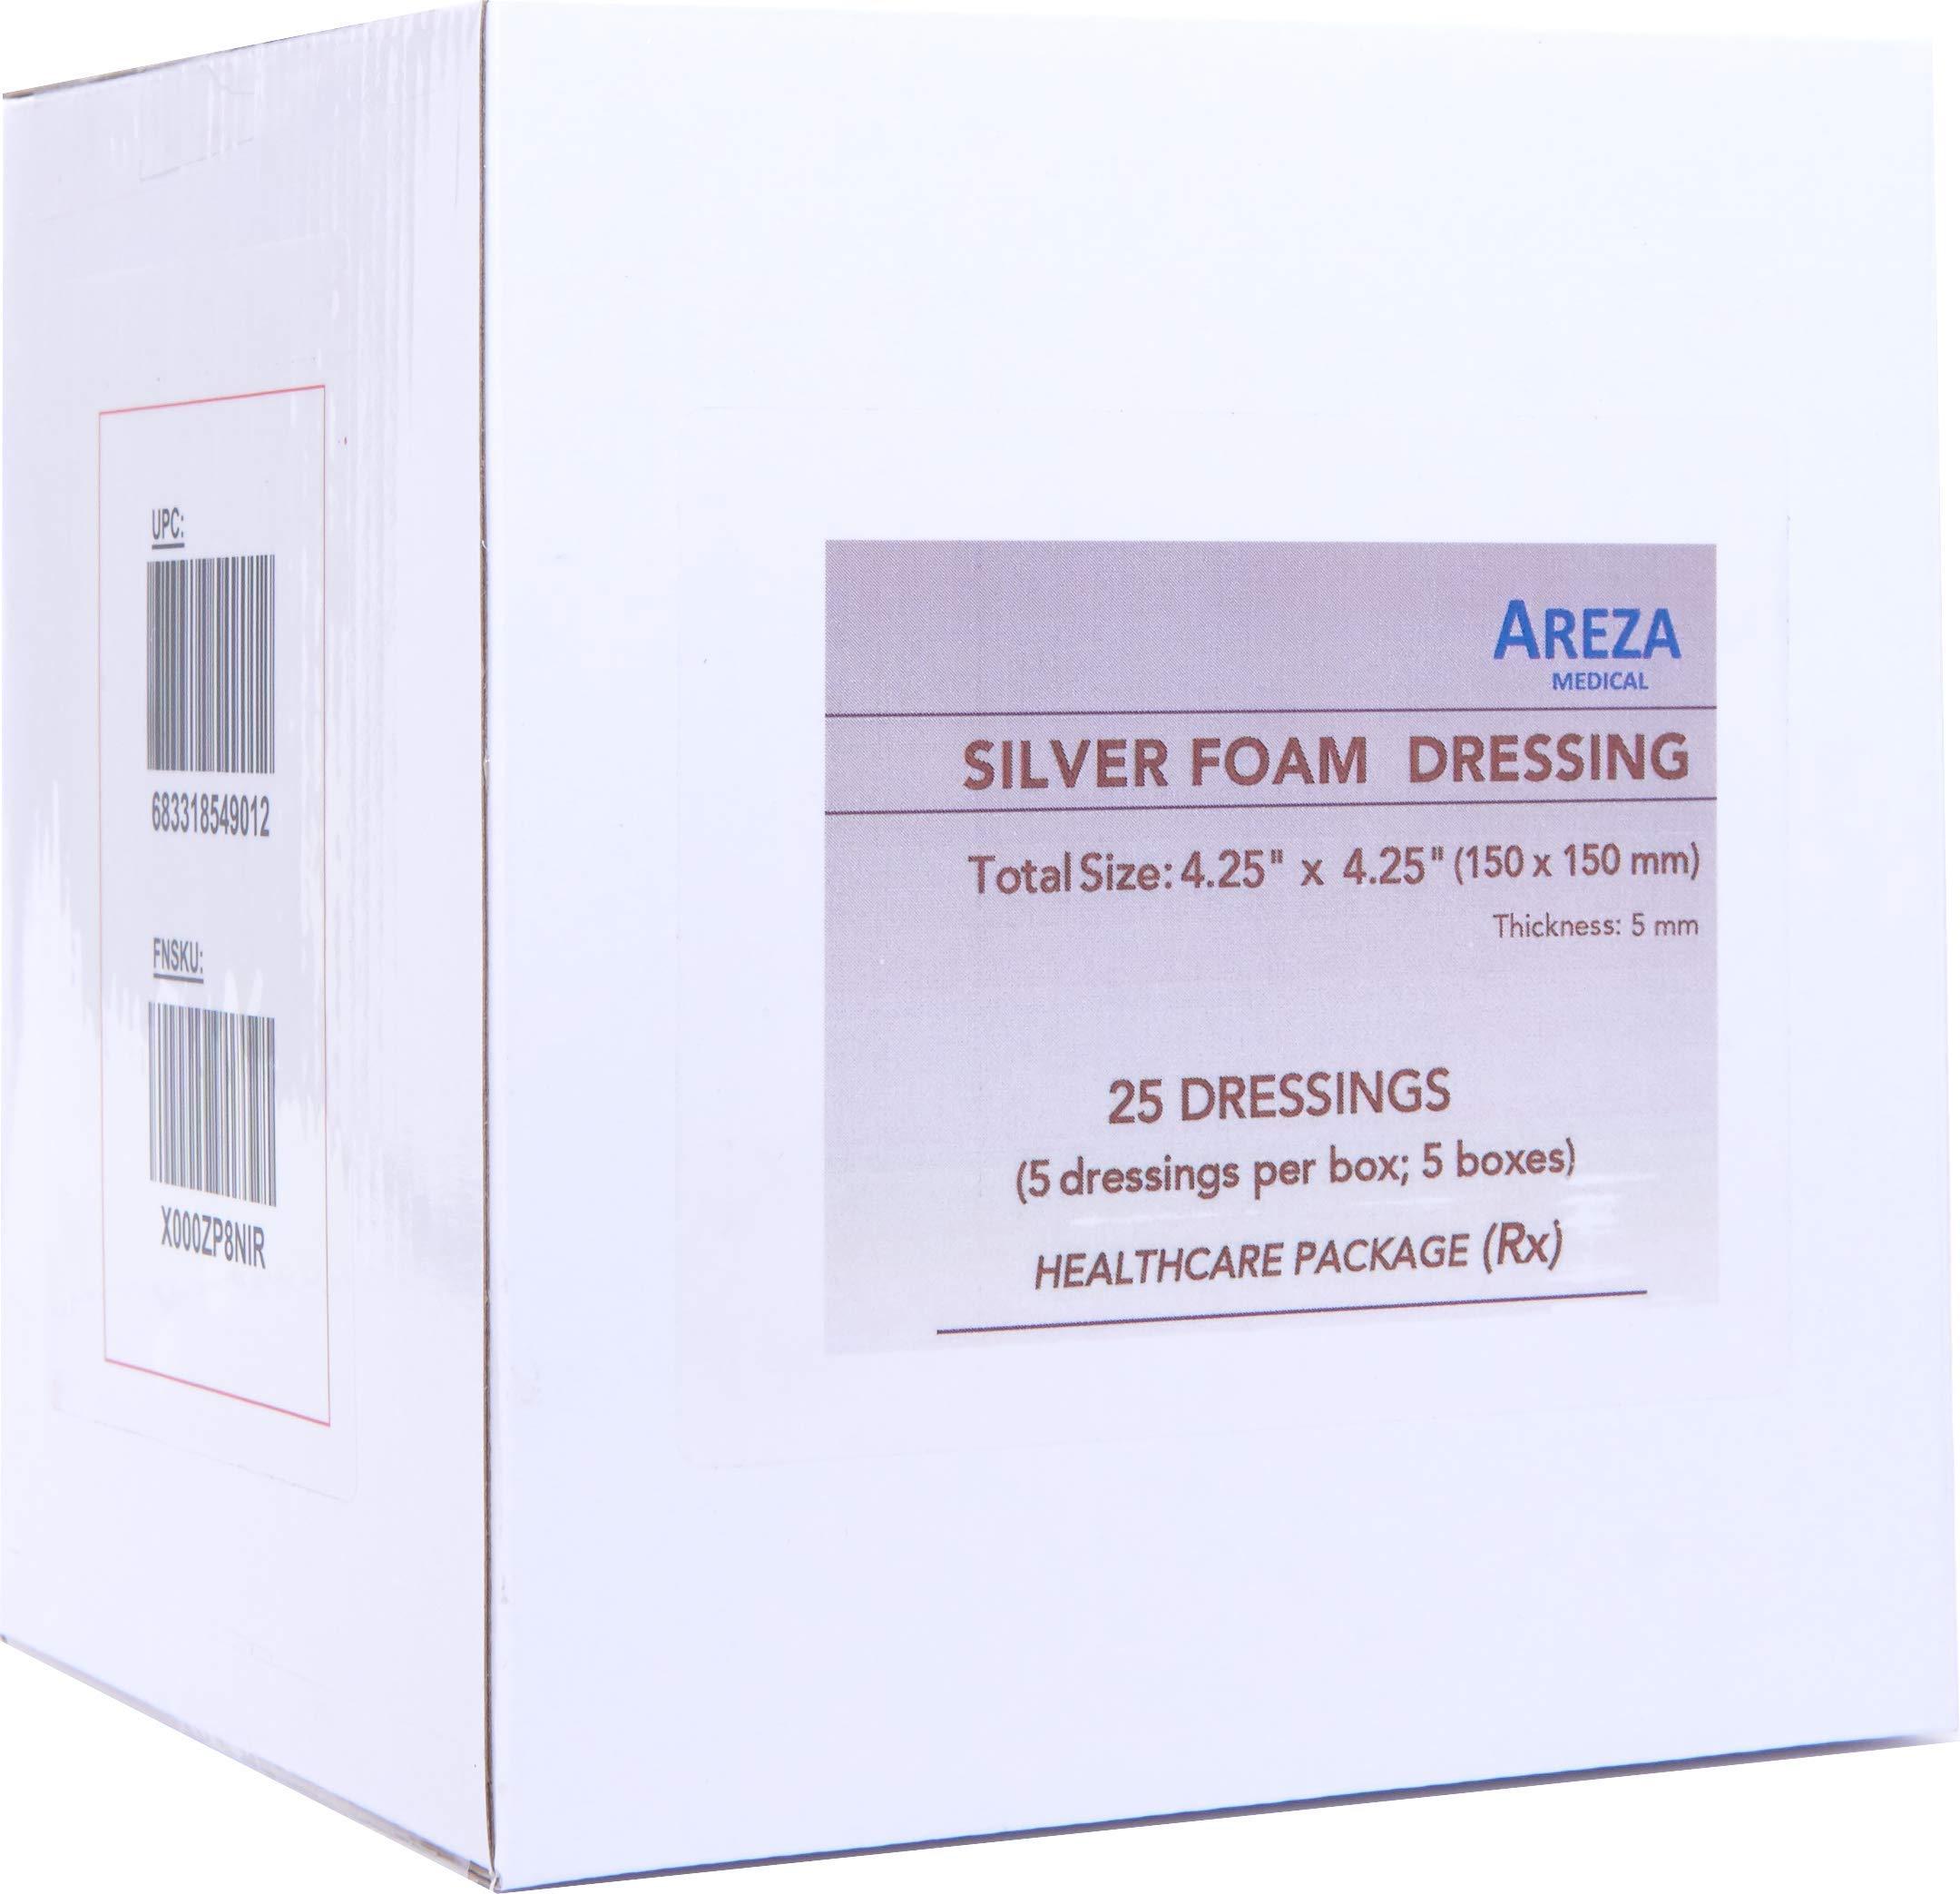 Silver Foam Dressing Sterile 4.25''x4.25'' 25 Dressings (Healthcare Provider Package)